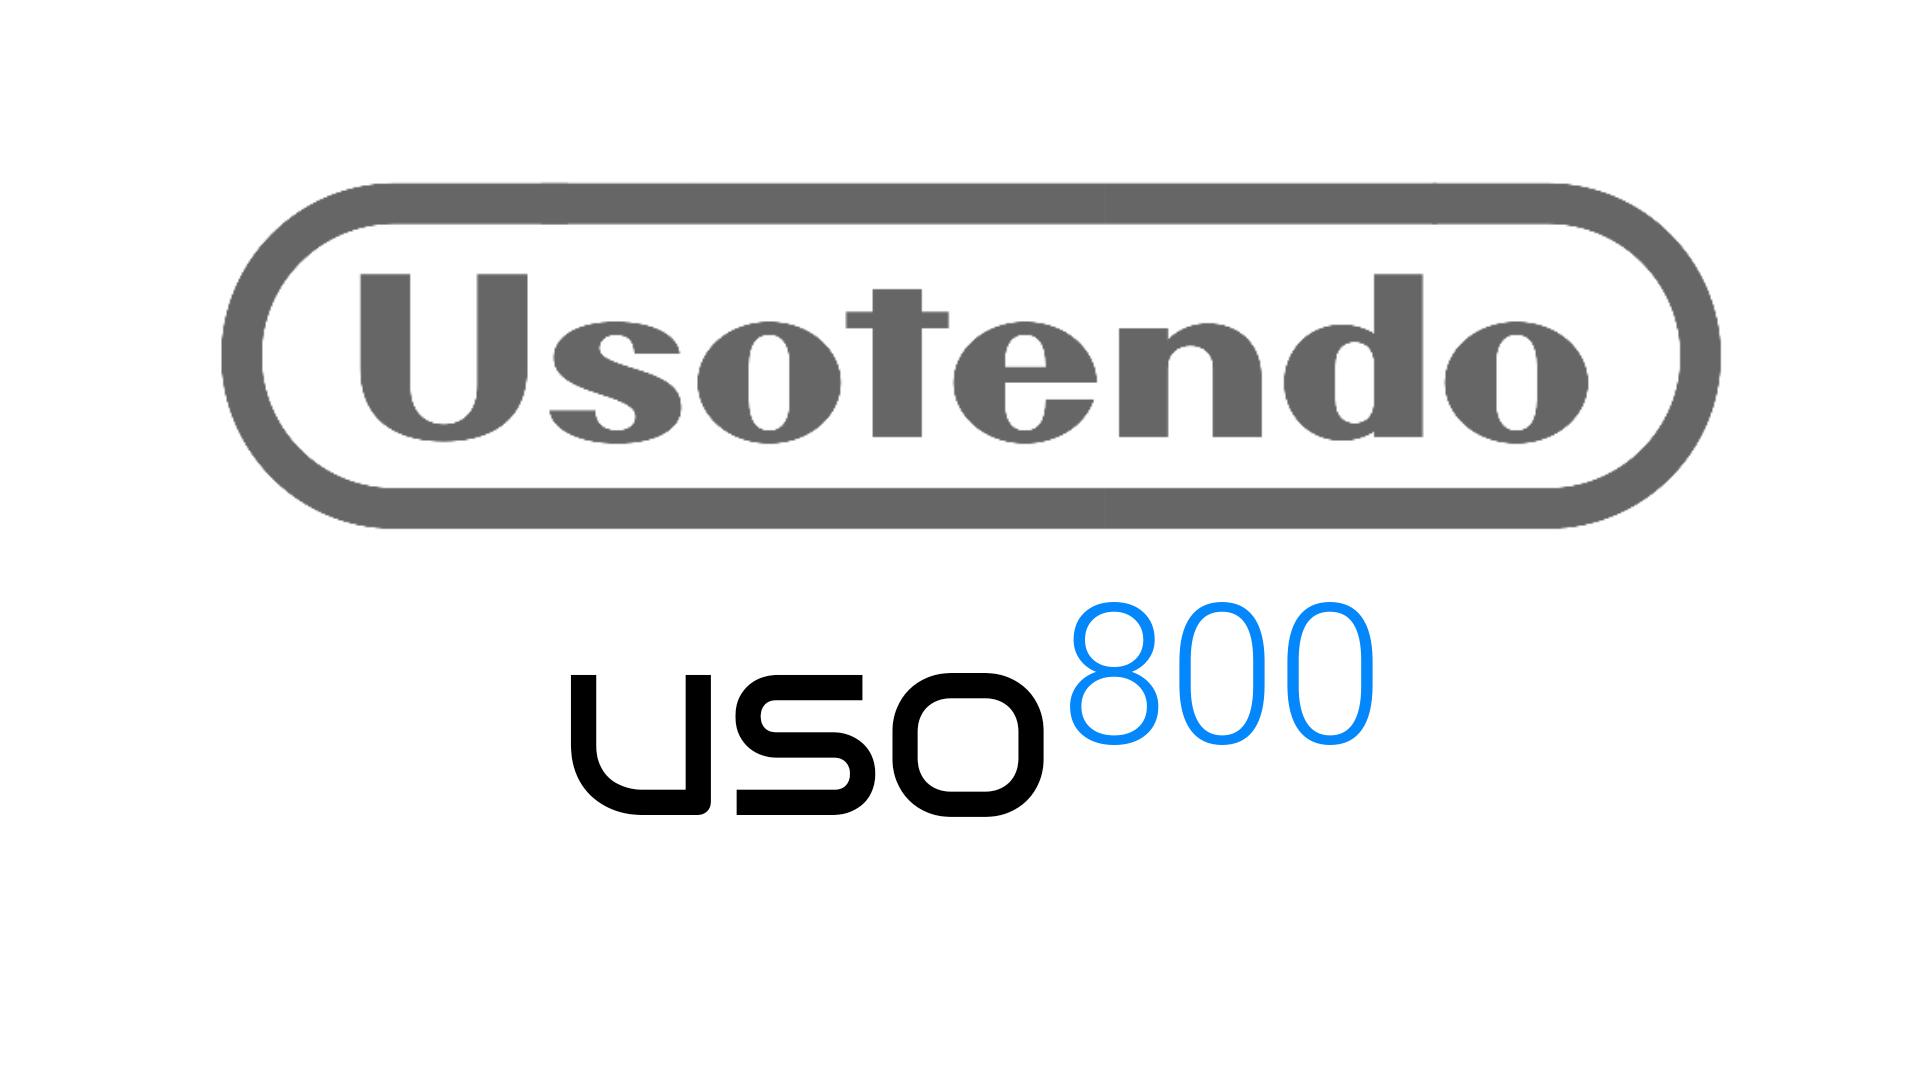 USO-800andUsotendo logo.png